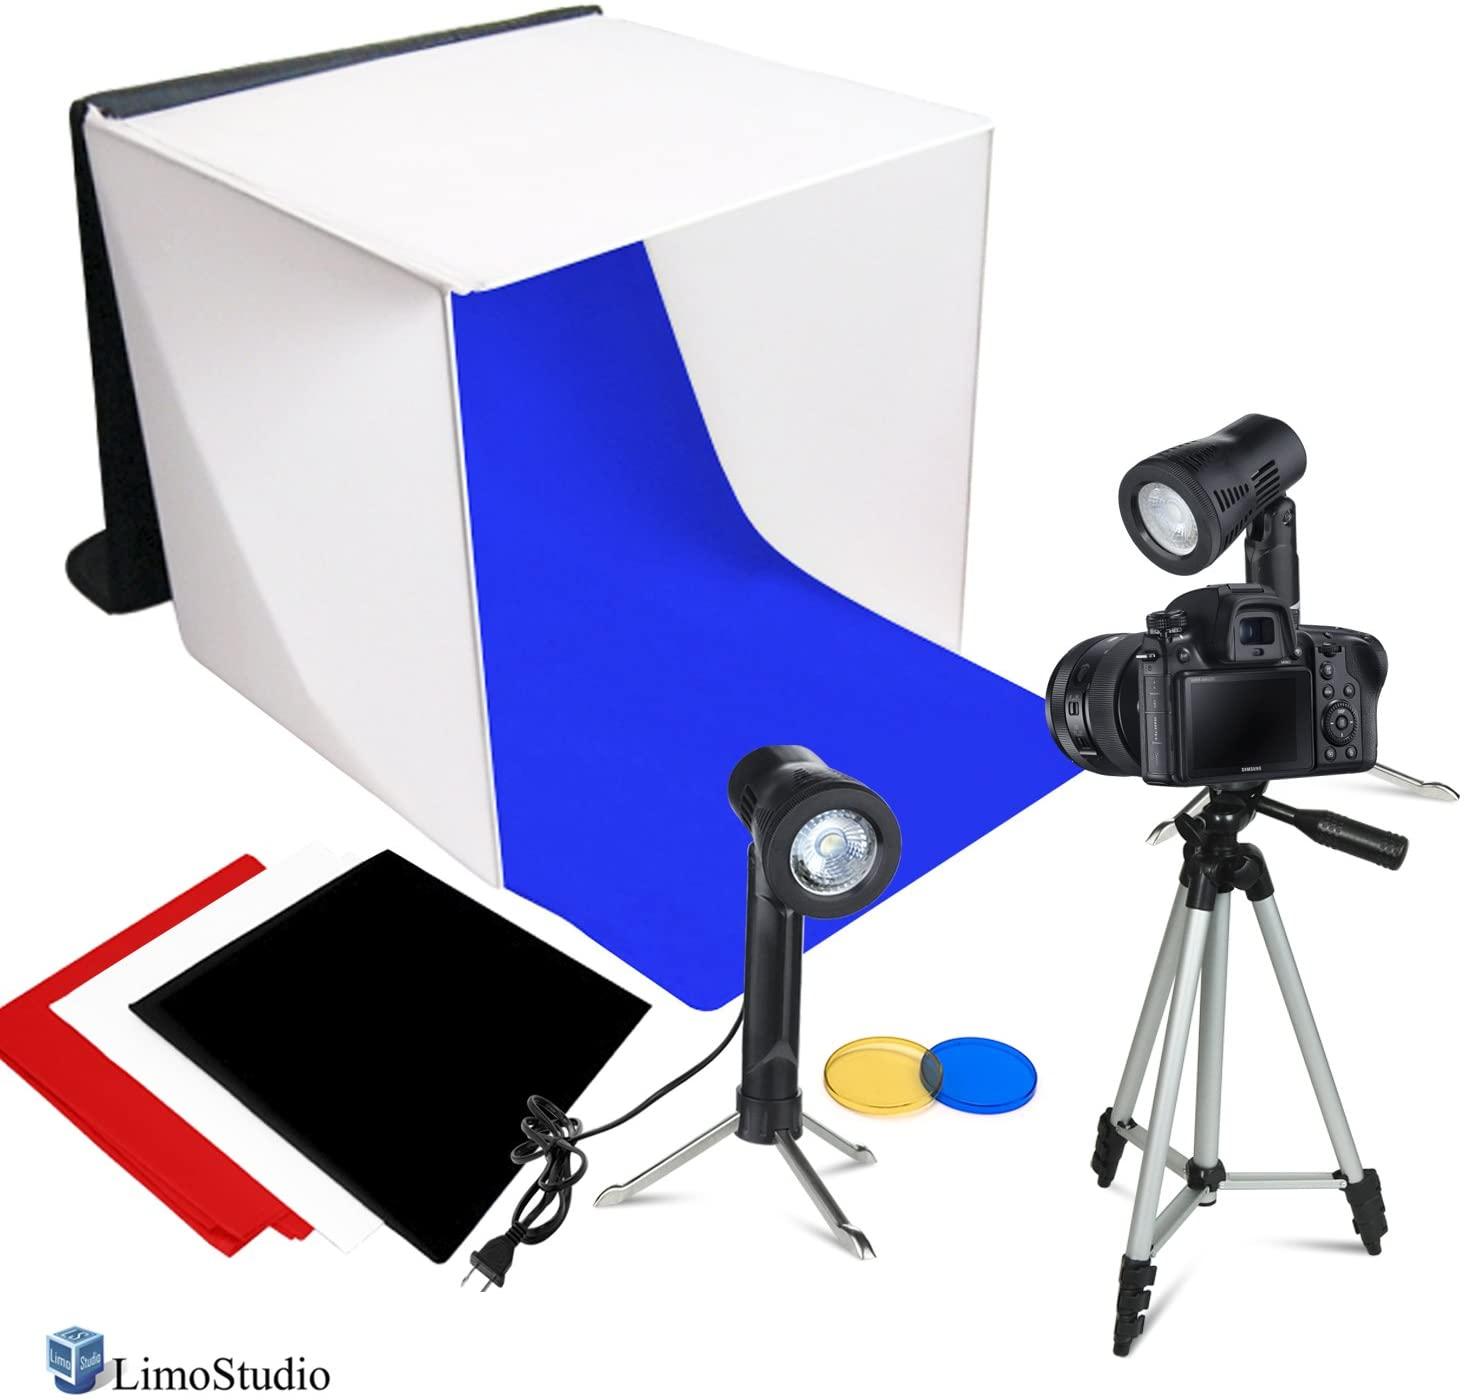 LimoStudio Photography Photo Video Studio Lighting Kit Set Photo Studio Light Box, 2 x High Output Lights, 4 x Chromakey Backgrounds, 1 x 41